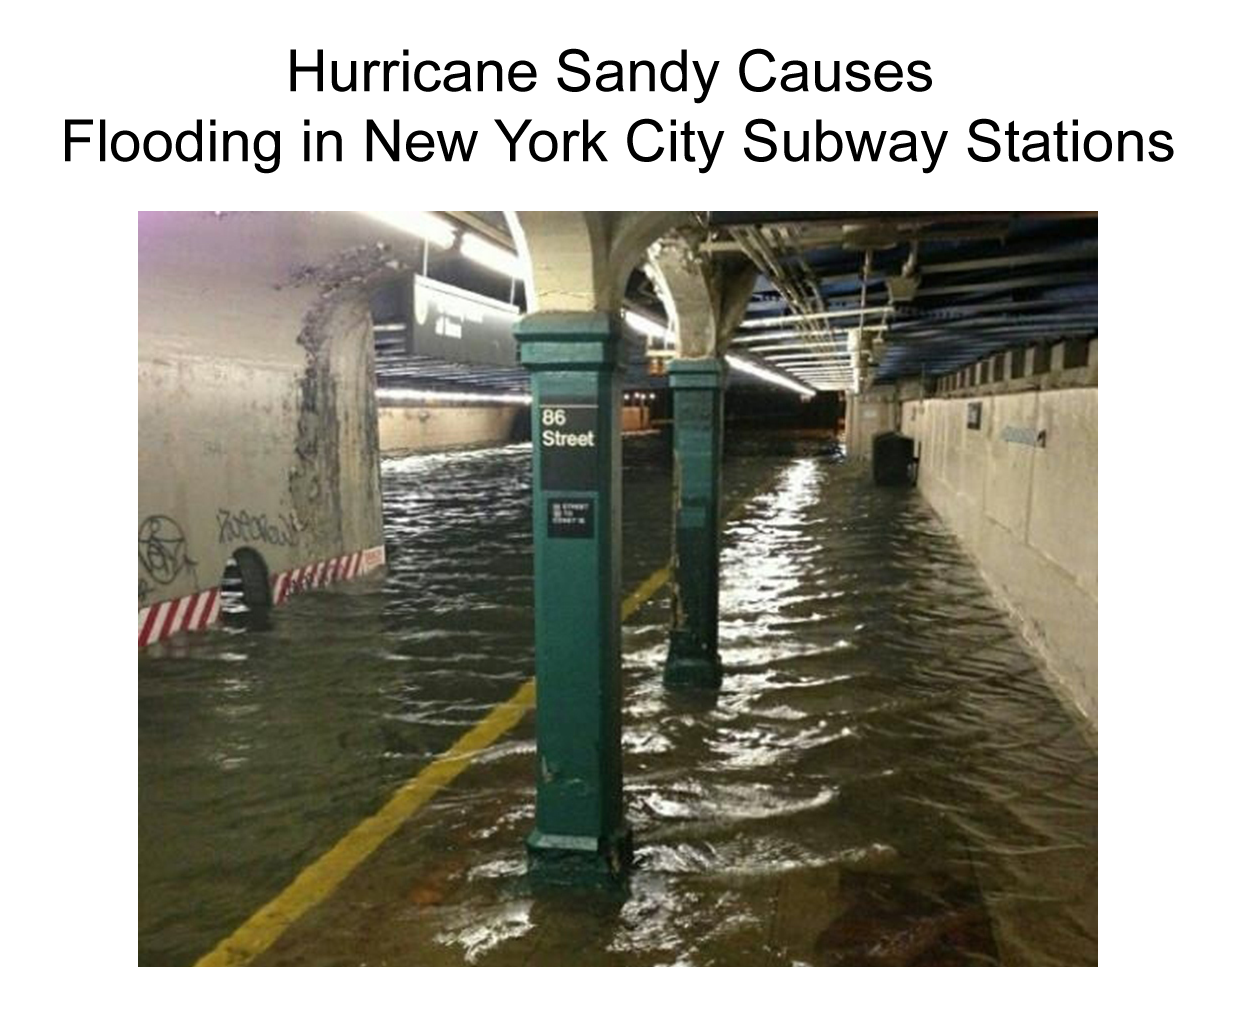 Hurricane Sandy Flooding Hurricane Sandy Causes